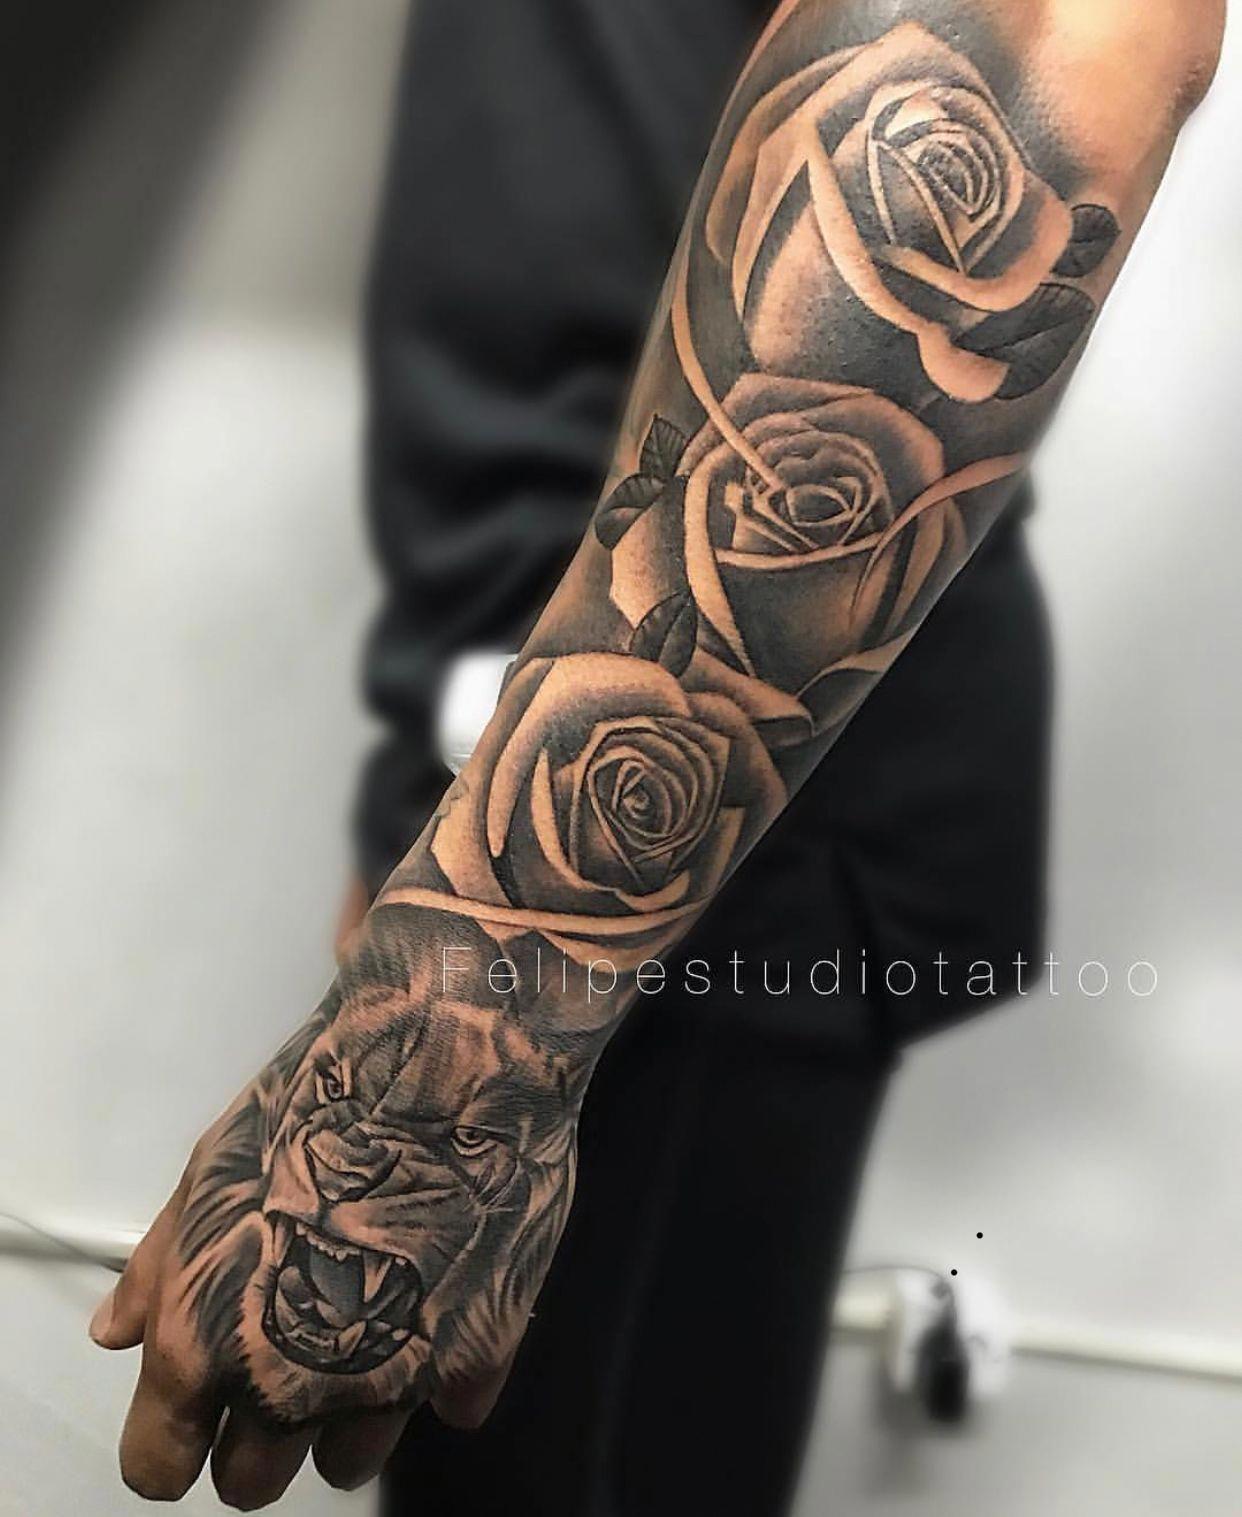 Tattoos For Men Forearm Tattoo Men Rose Tattoo Sleeve Rose Tattoos For Men